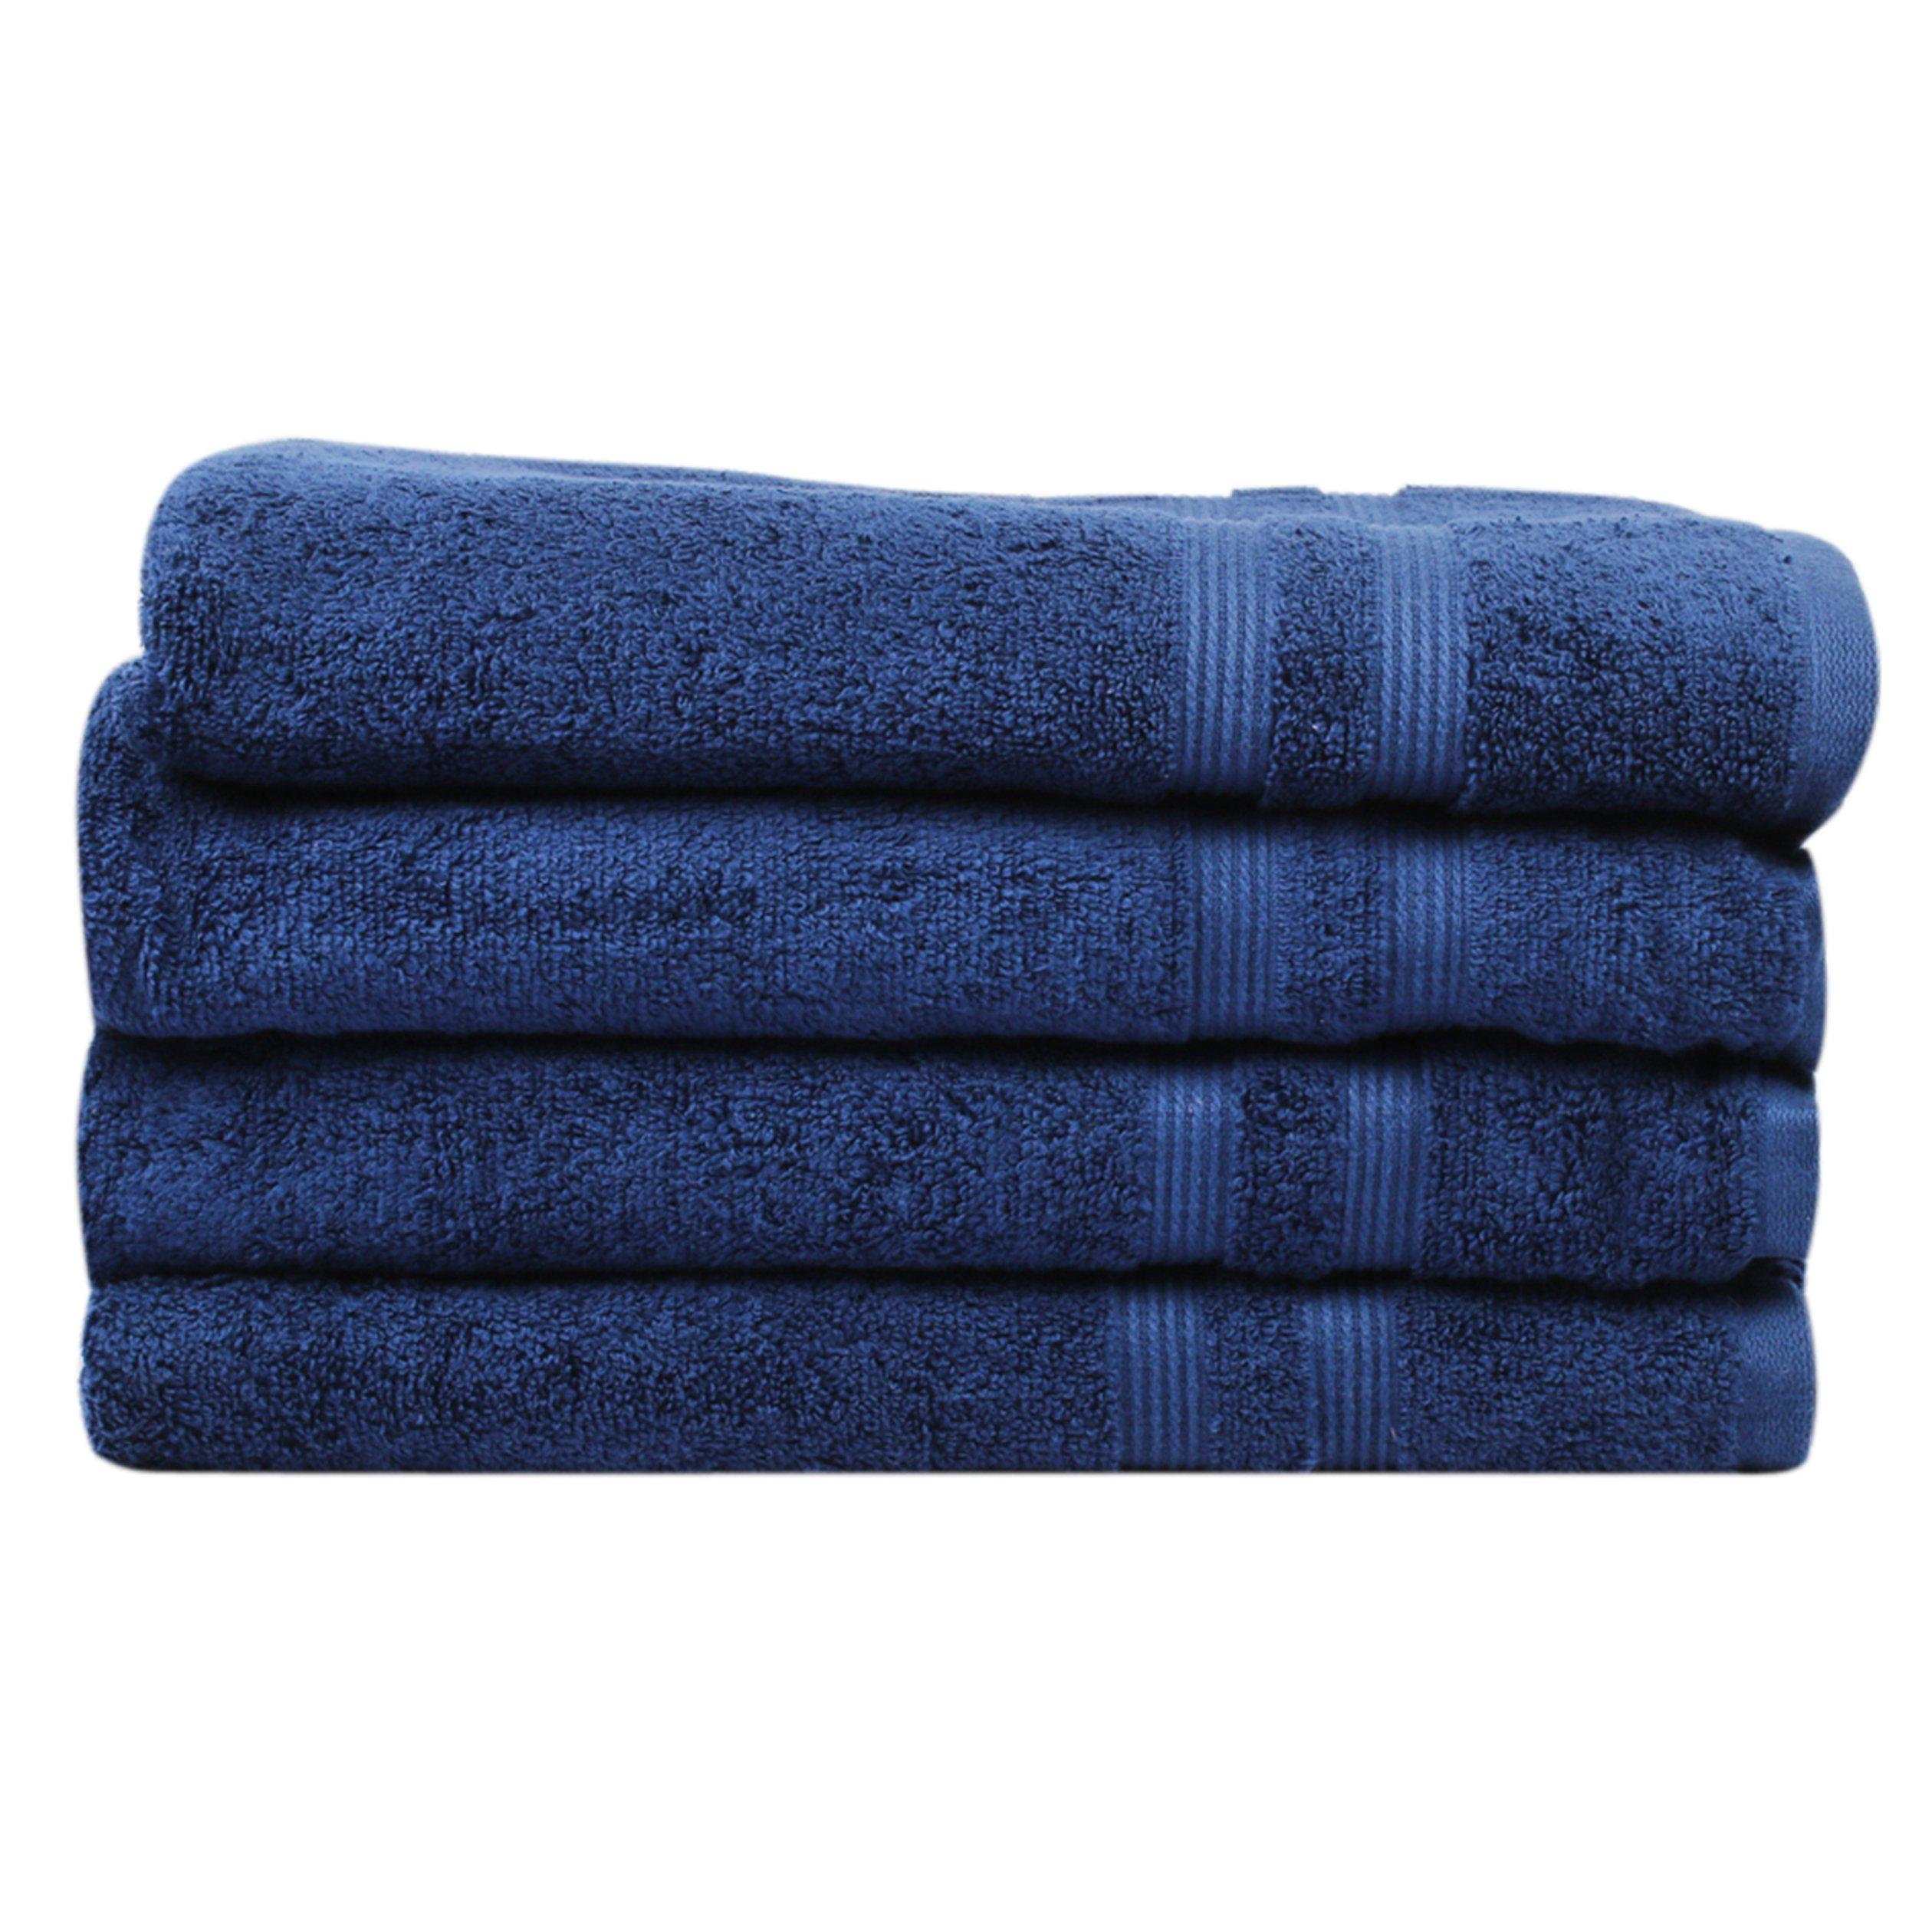 Divine 100% Ringspun Cotton Premium Luxury Turkish Bath Towels (30x54 Inch)–Set of 4,Plush,Soft,Ultra Absorbent,Machine Washable,Quick Dry,Eco-Friendly, SPA/Hotel Quality Towel Set (Navy Blue)